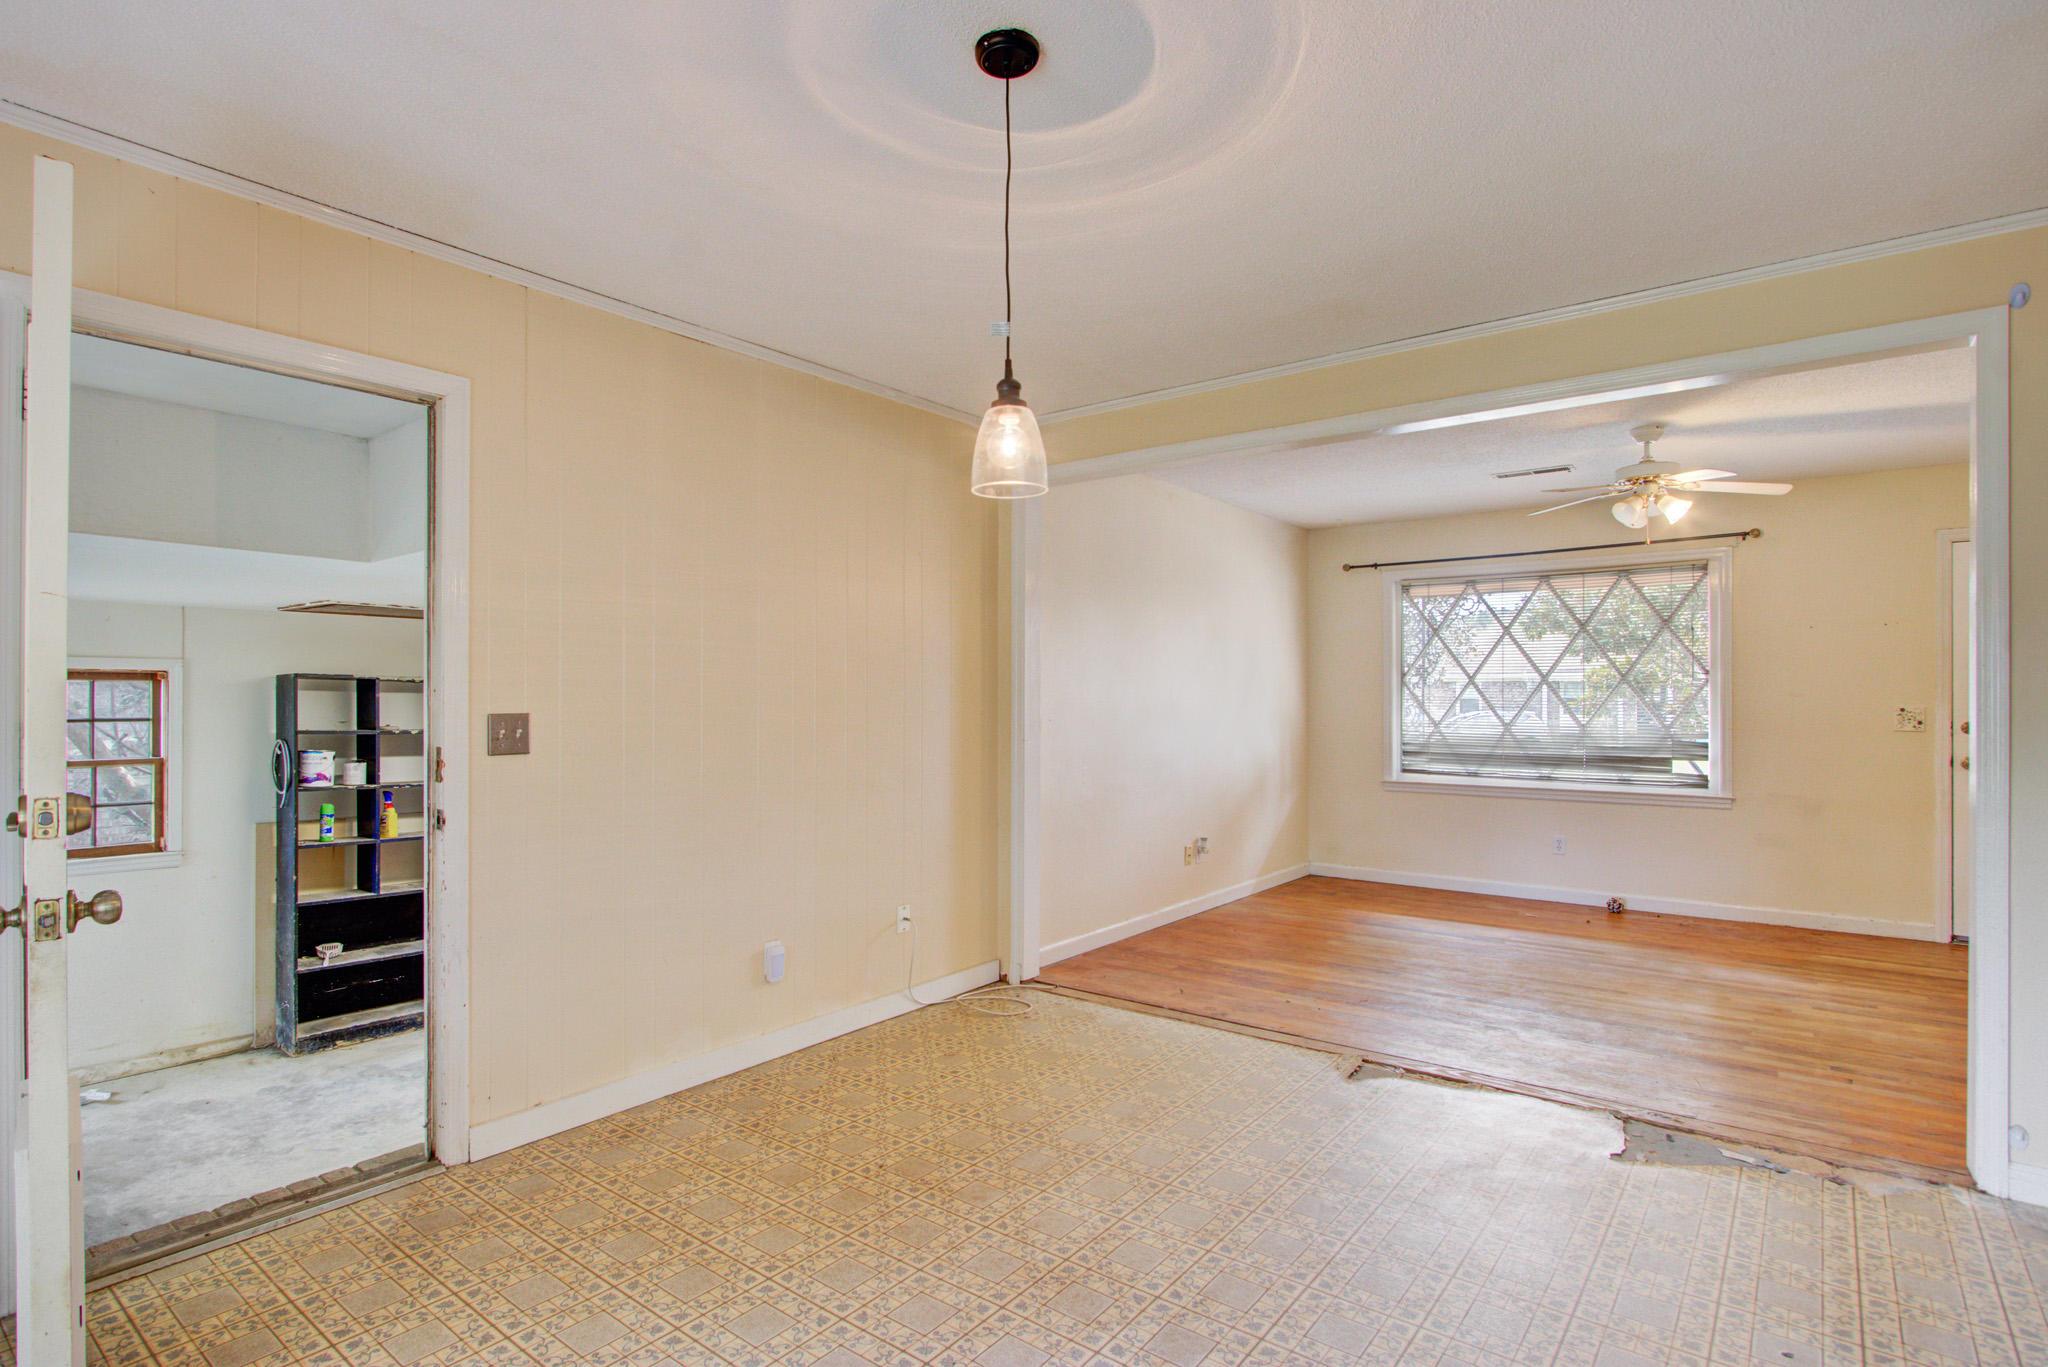 Bushy Park Terrace Homes For Sale - 125 Azalea, Goose Creek, SC - 14